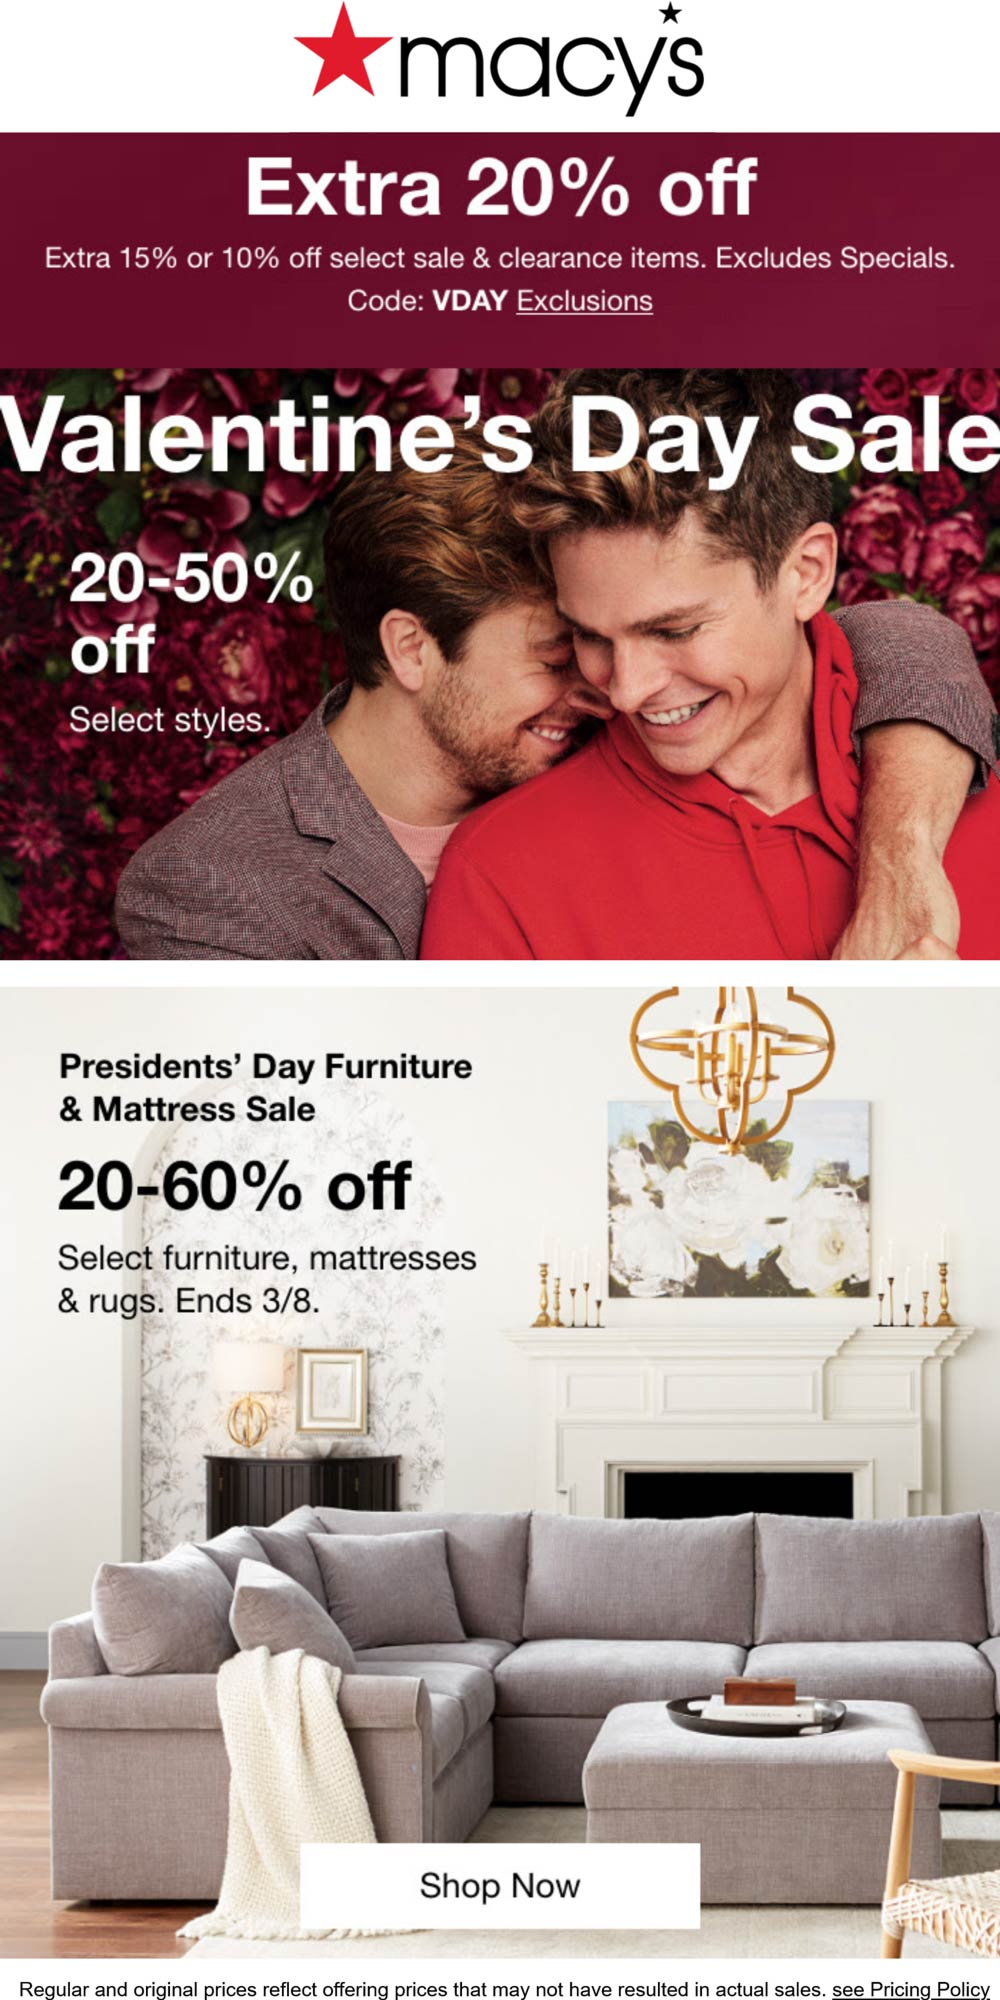 Macys stores Coupon  Extra 20% off at Macys, or online via promo code VDAY #macys